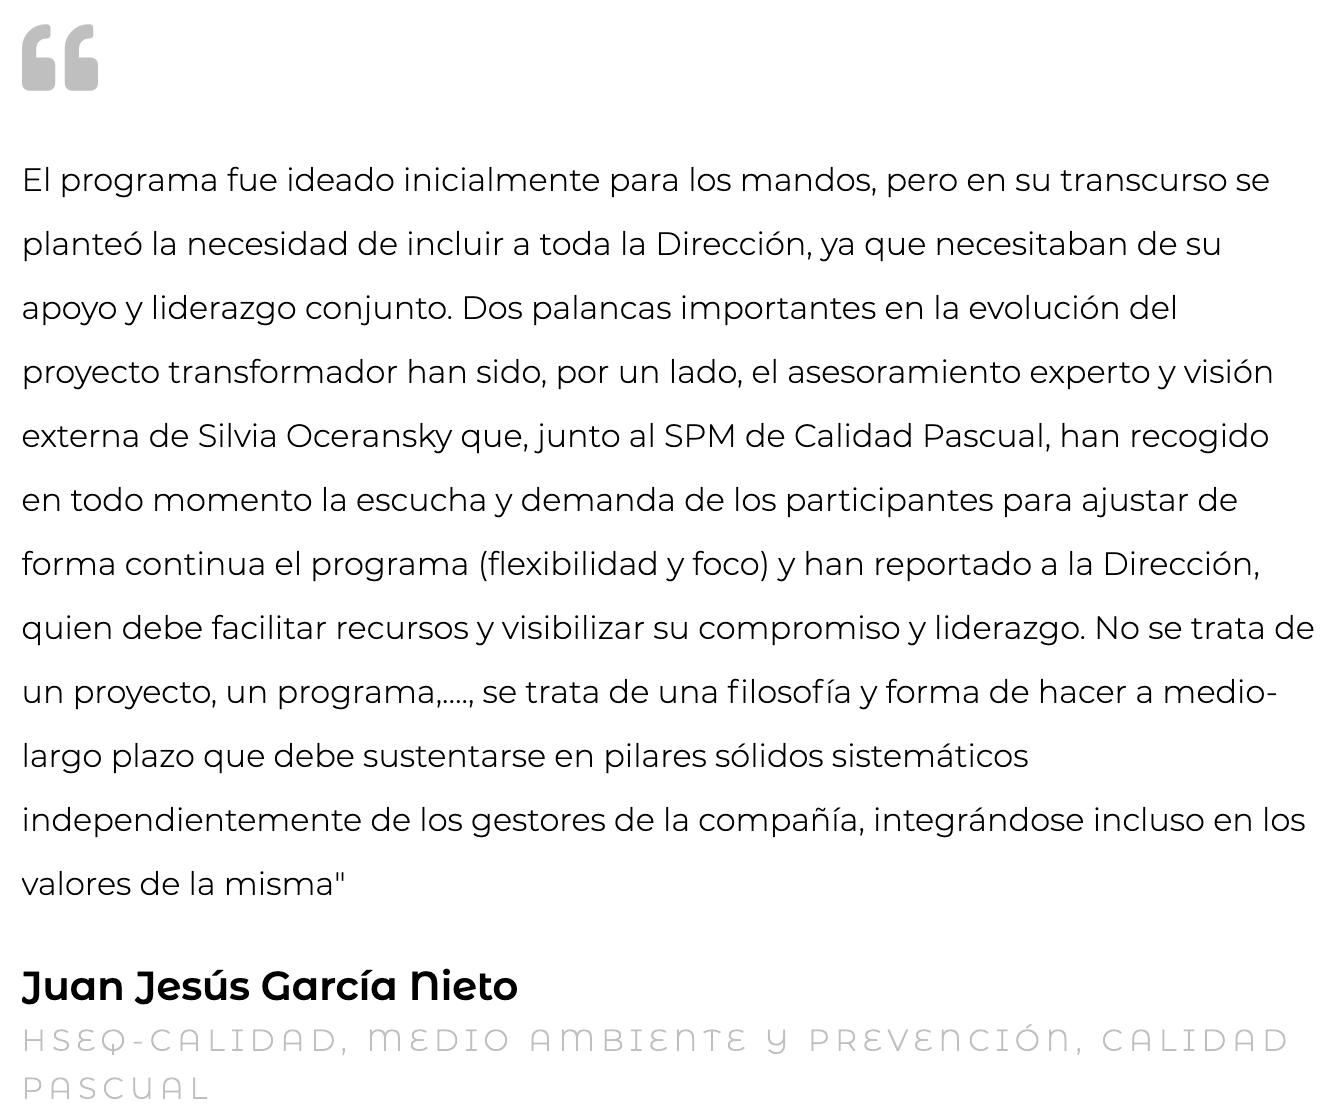 Silvia Oceransky Cultura Preventiva opiniones cultura organizacional Juan Jesus Garcia Nieto